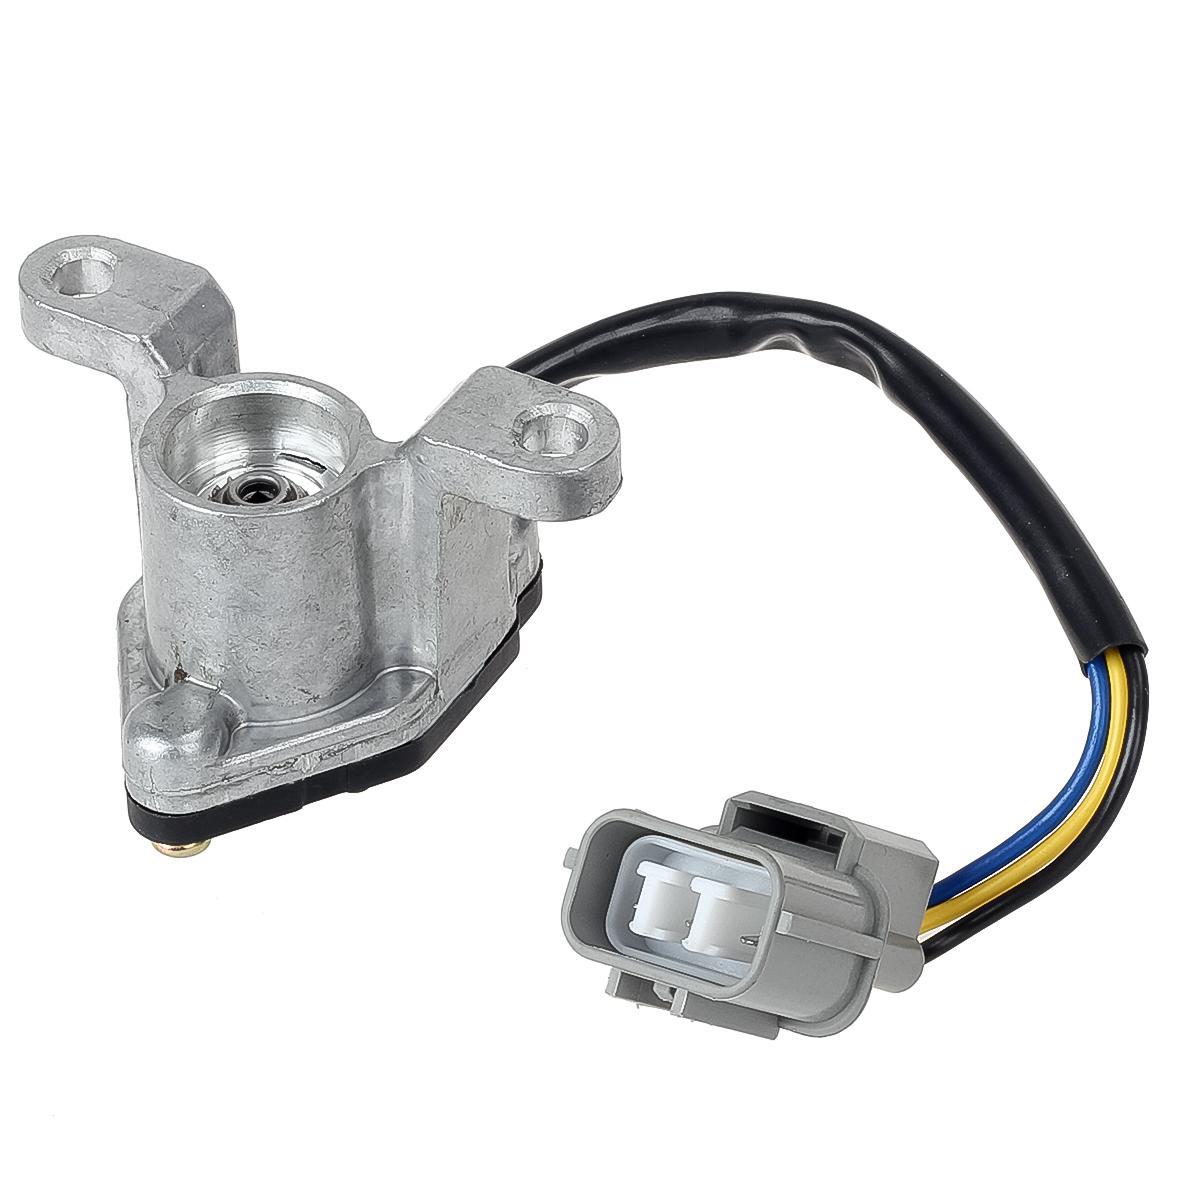 Sc137 Vehicle Speed Sensor Vss For 90 91 Honda Accord 92 93 1990 Prelude Tail Light Wiring